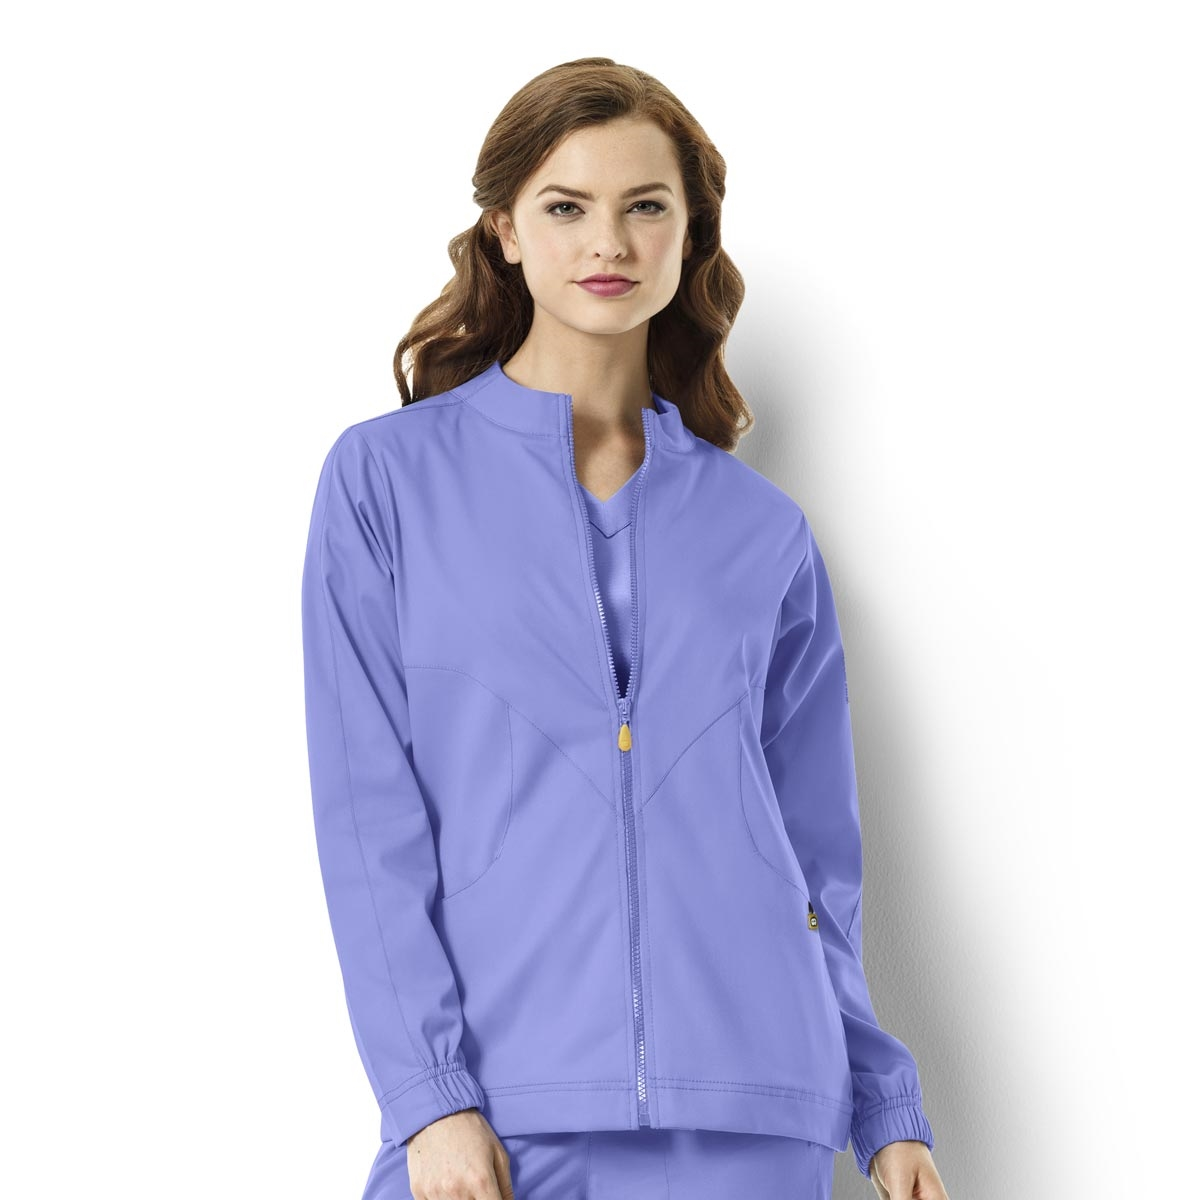 d3fb03e11e0 Zip-Front Warm-Up Jacket Next Boston Women's Jacket - WonderWink Scrubs